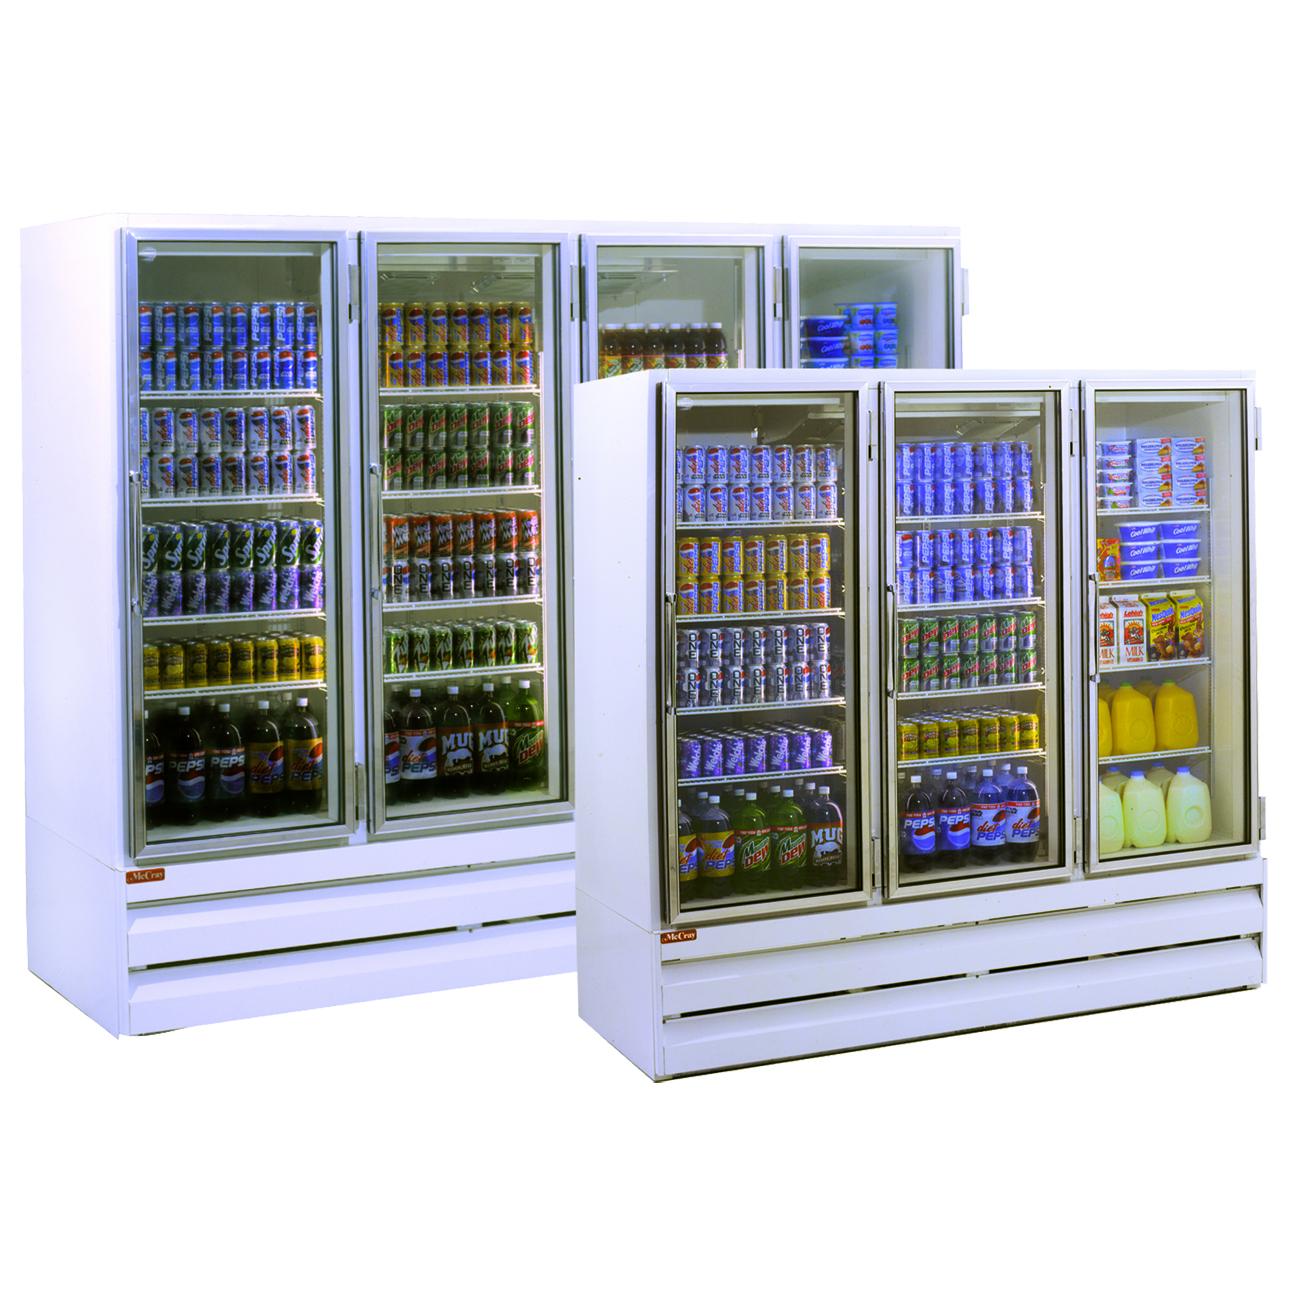 Howard-McCray GF102BM-FF freezer, merchandiser